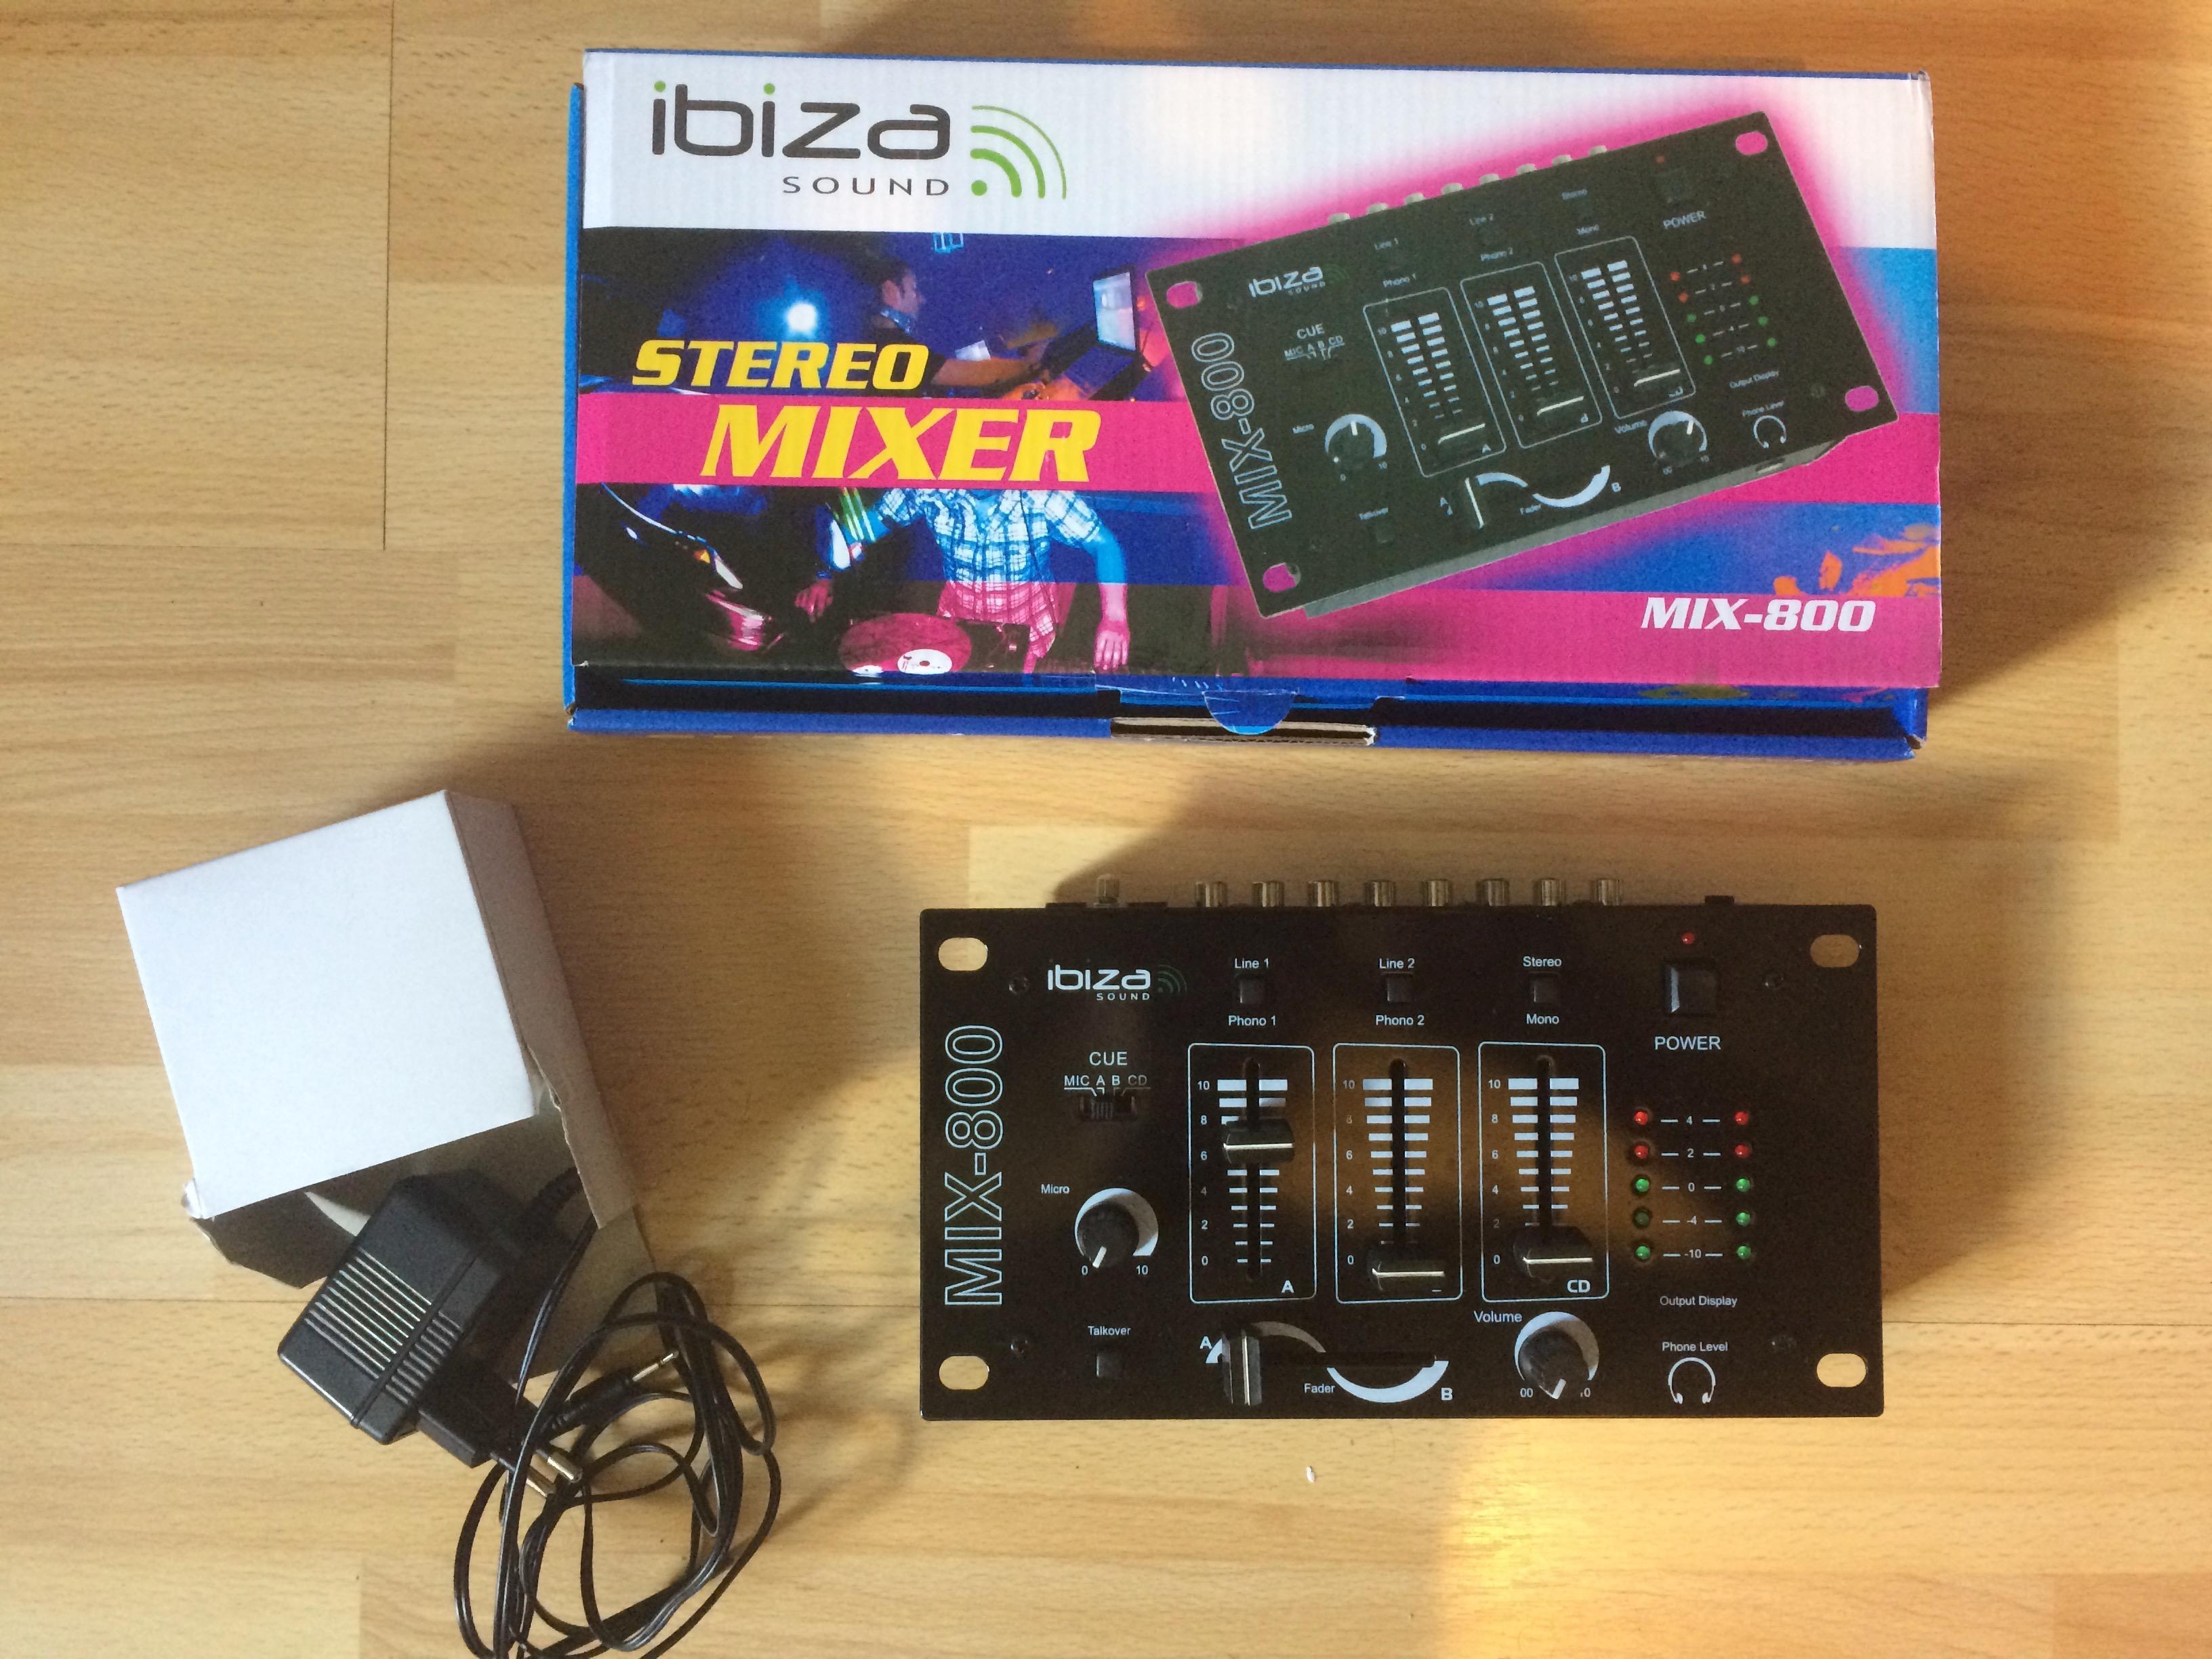 Vend pack de sonorisation ibiza sound haute normandie - Table de mixage ibiza mix 800 ...